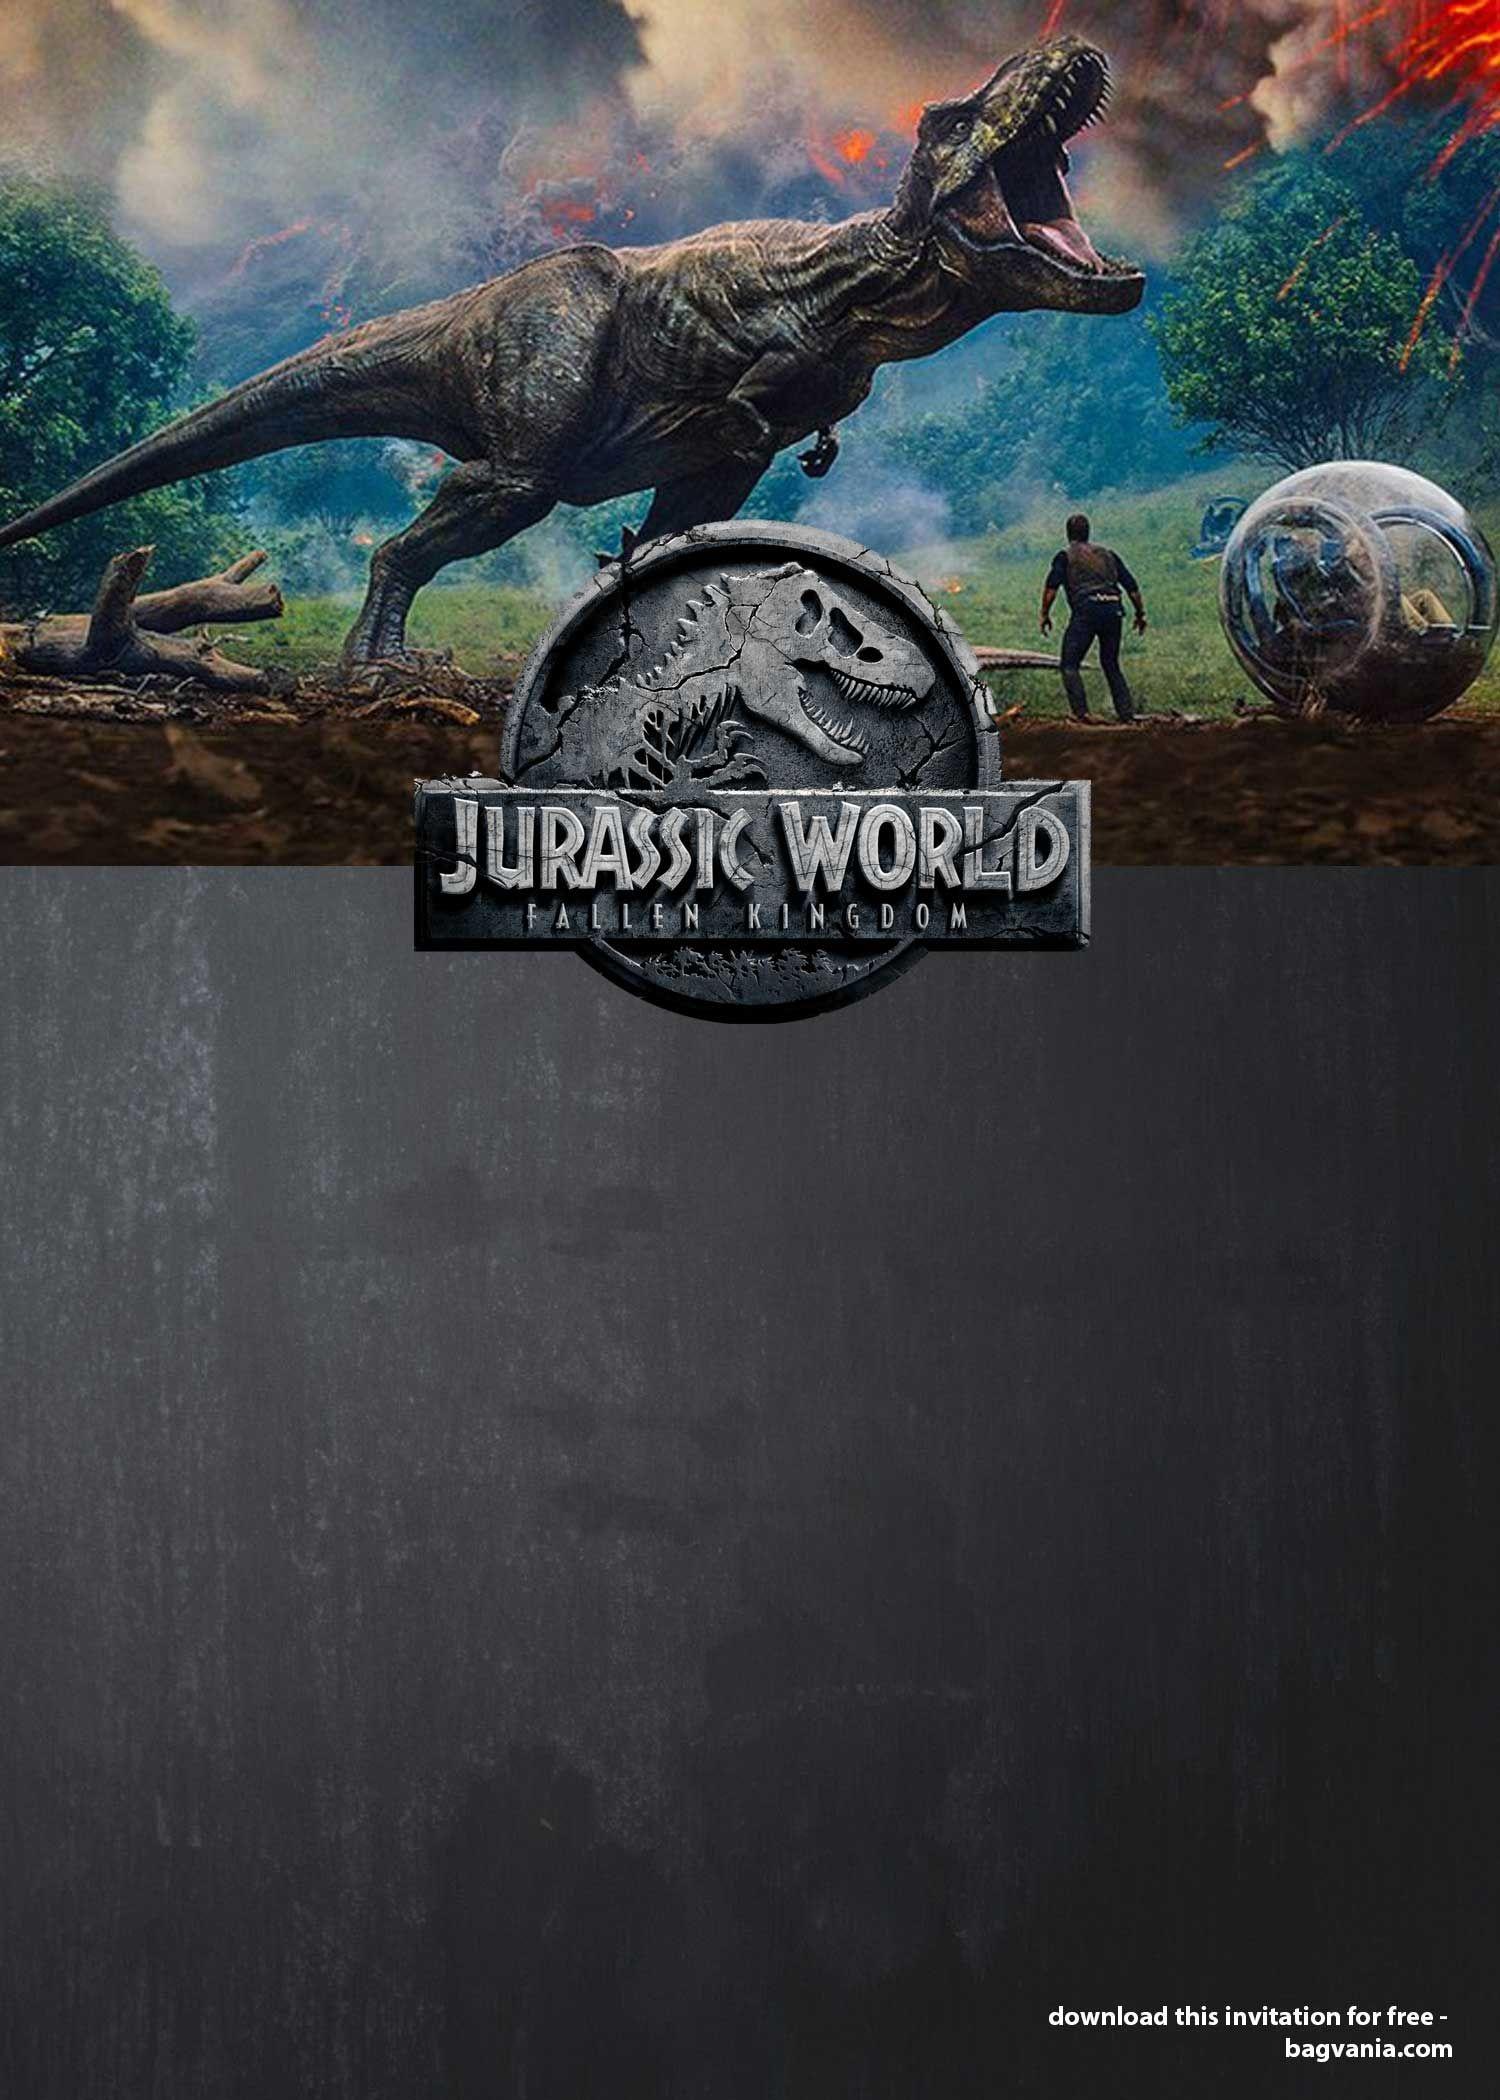 Jurassic World : Fallen Kingdom Birthday Party Ideas - Free - Free Printable Jurassic World Invitations